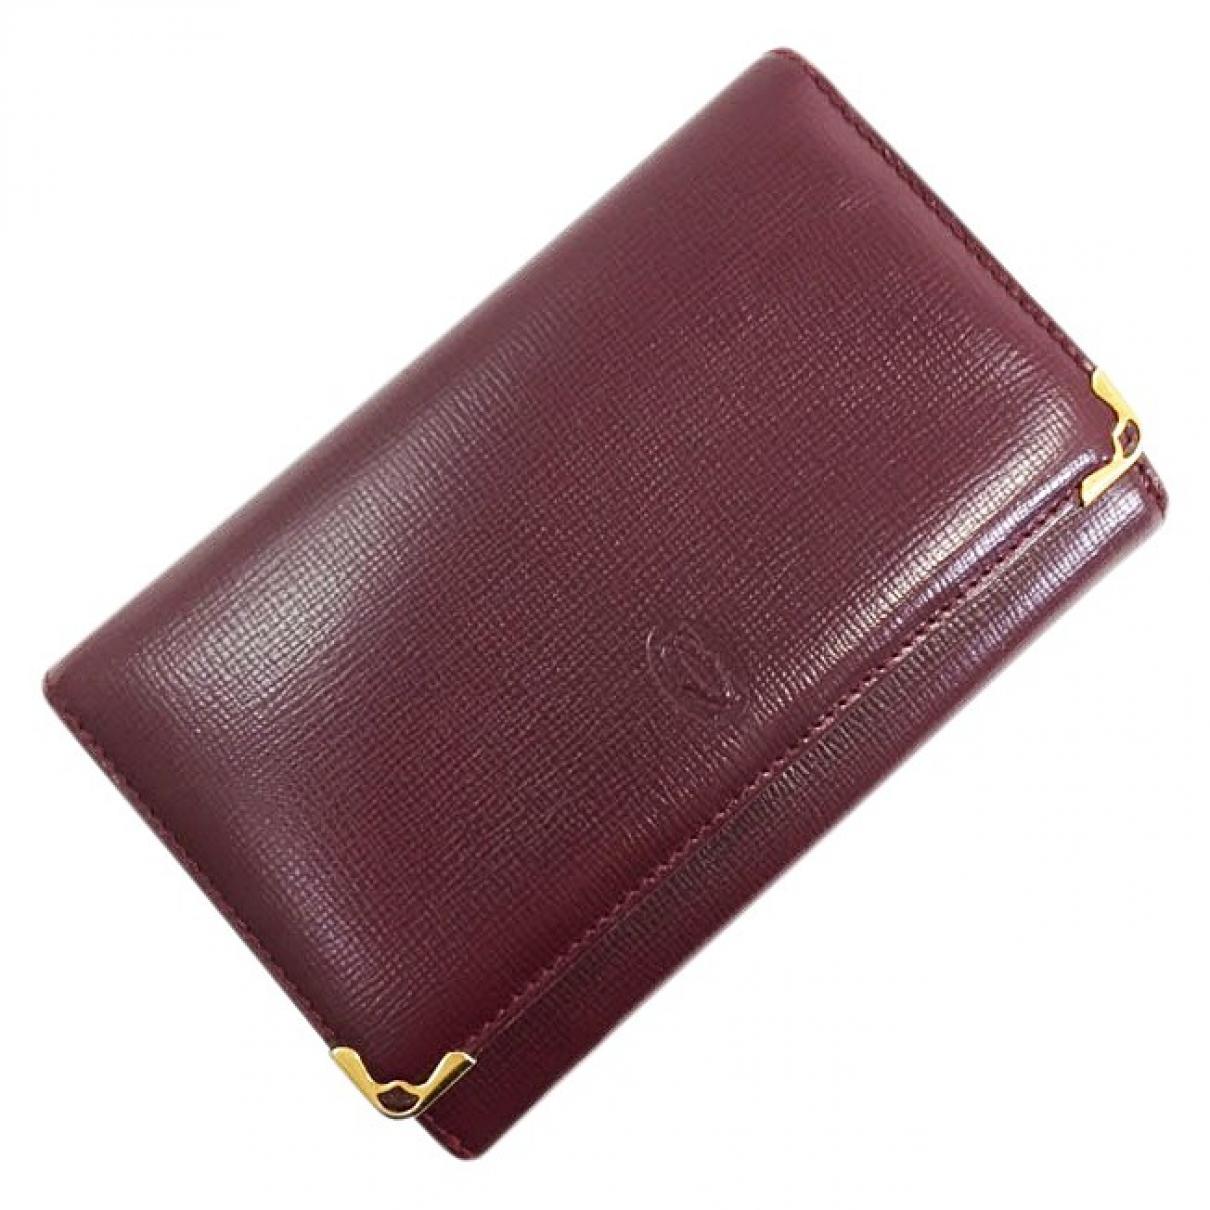 Cartier \N Burgundy Leather wallet for Women \N